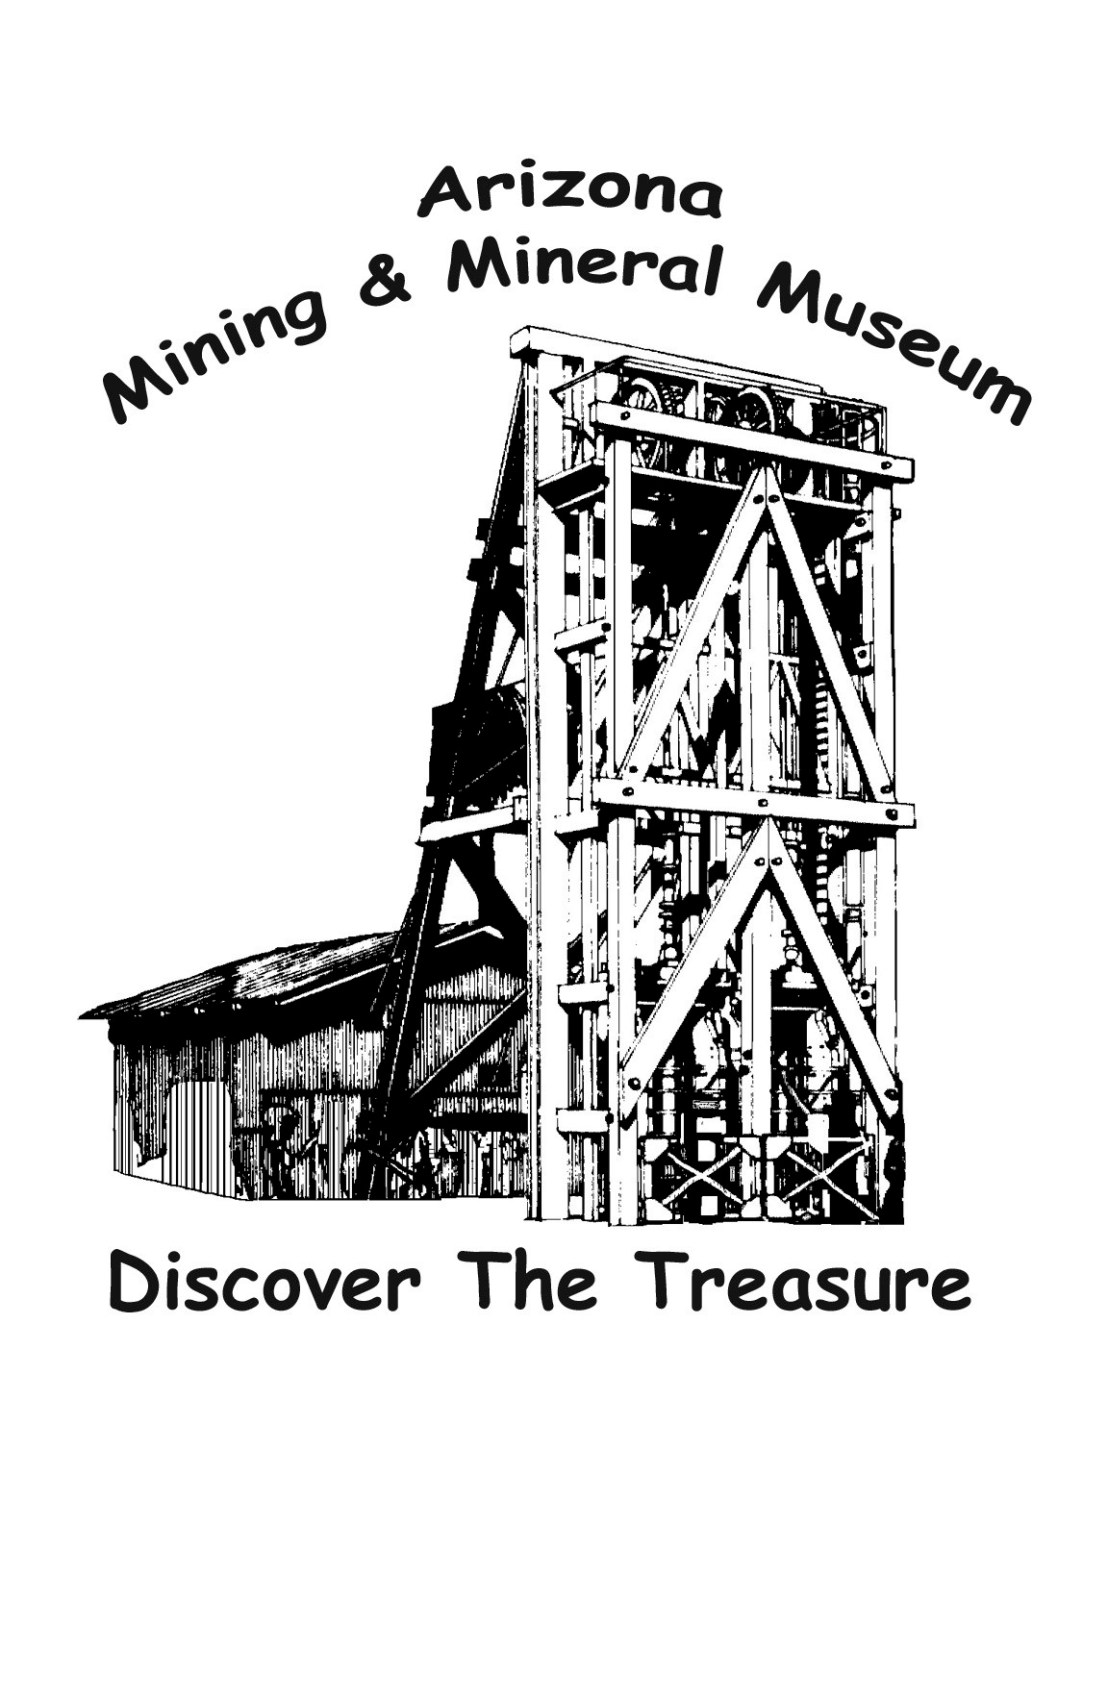 Arizona Mining and Mineral MuseumPhotos